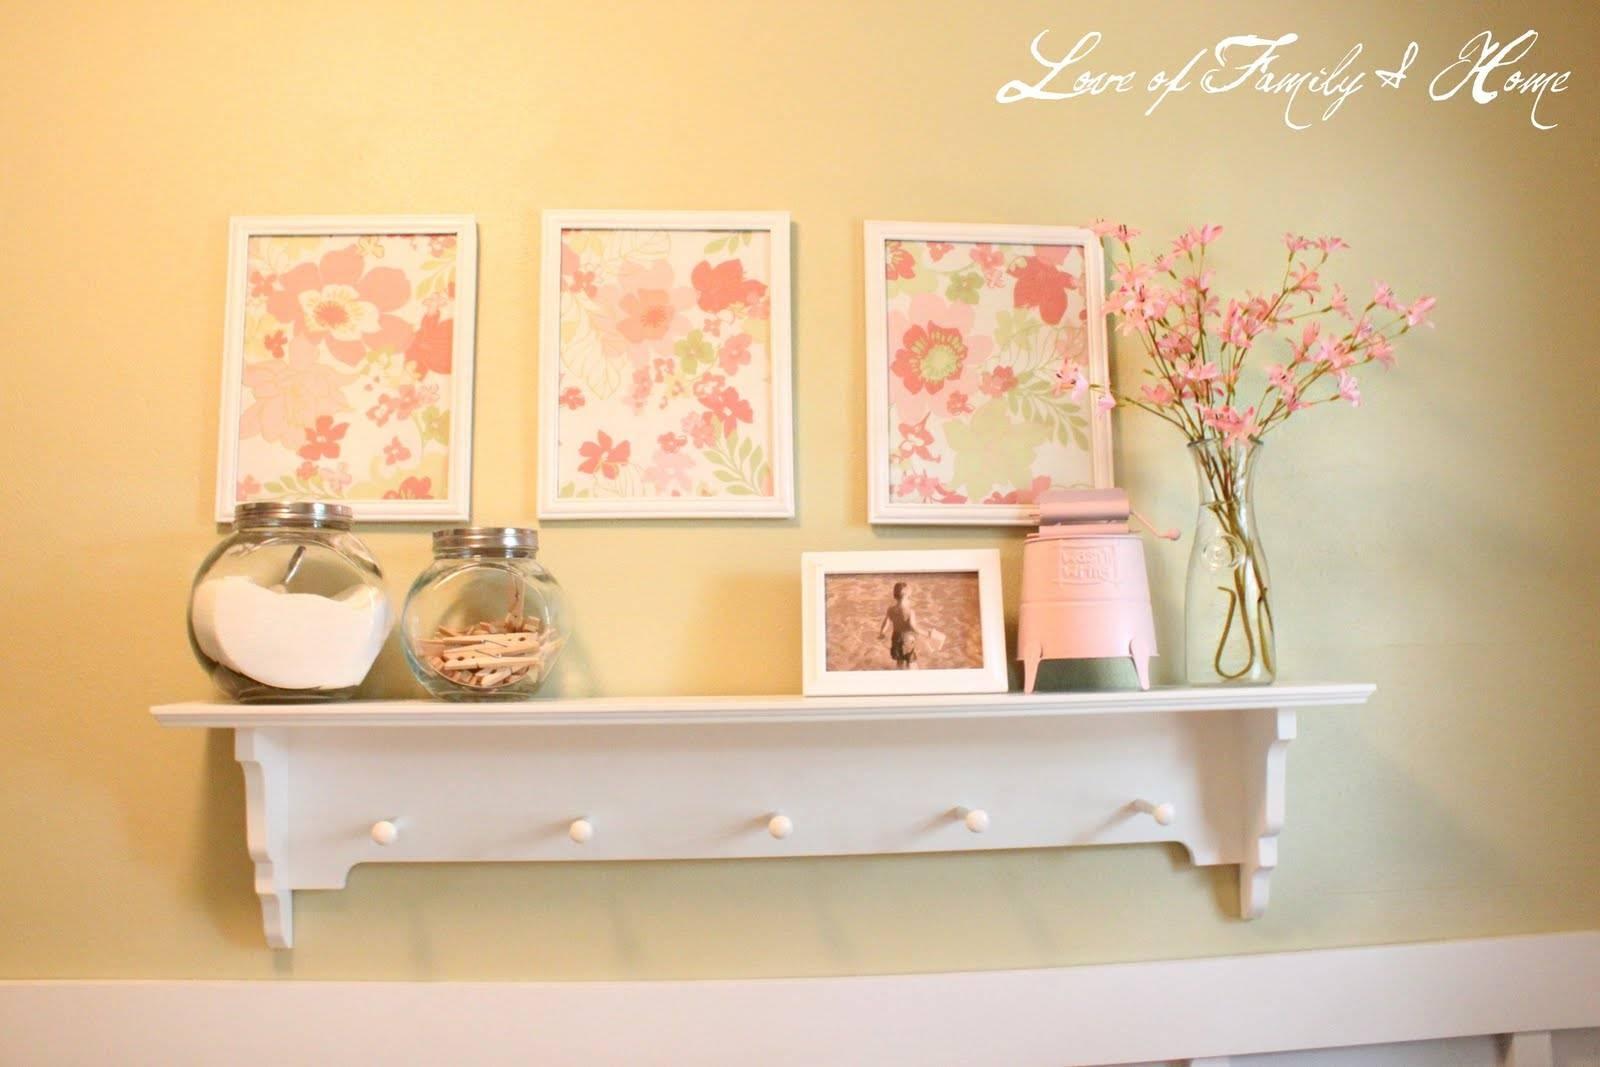 Laundry Room Wall Decor Art Ideas On Decorating Living Walls ...